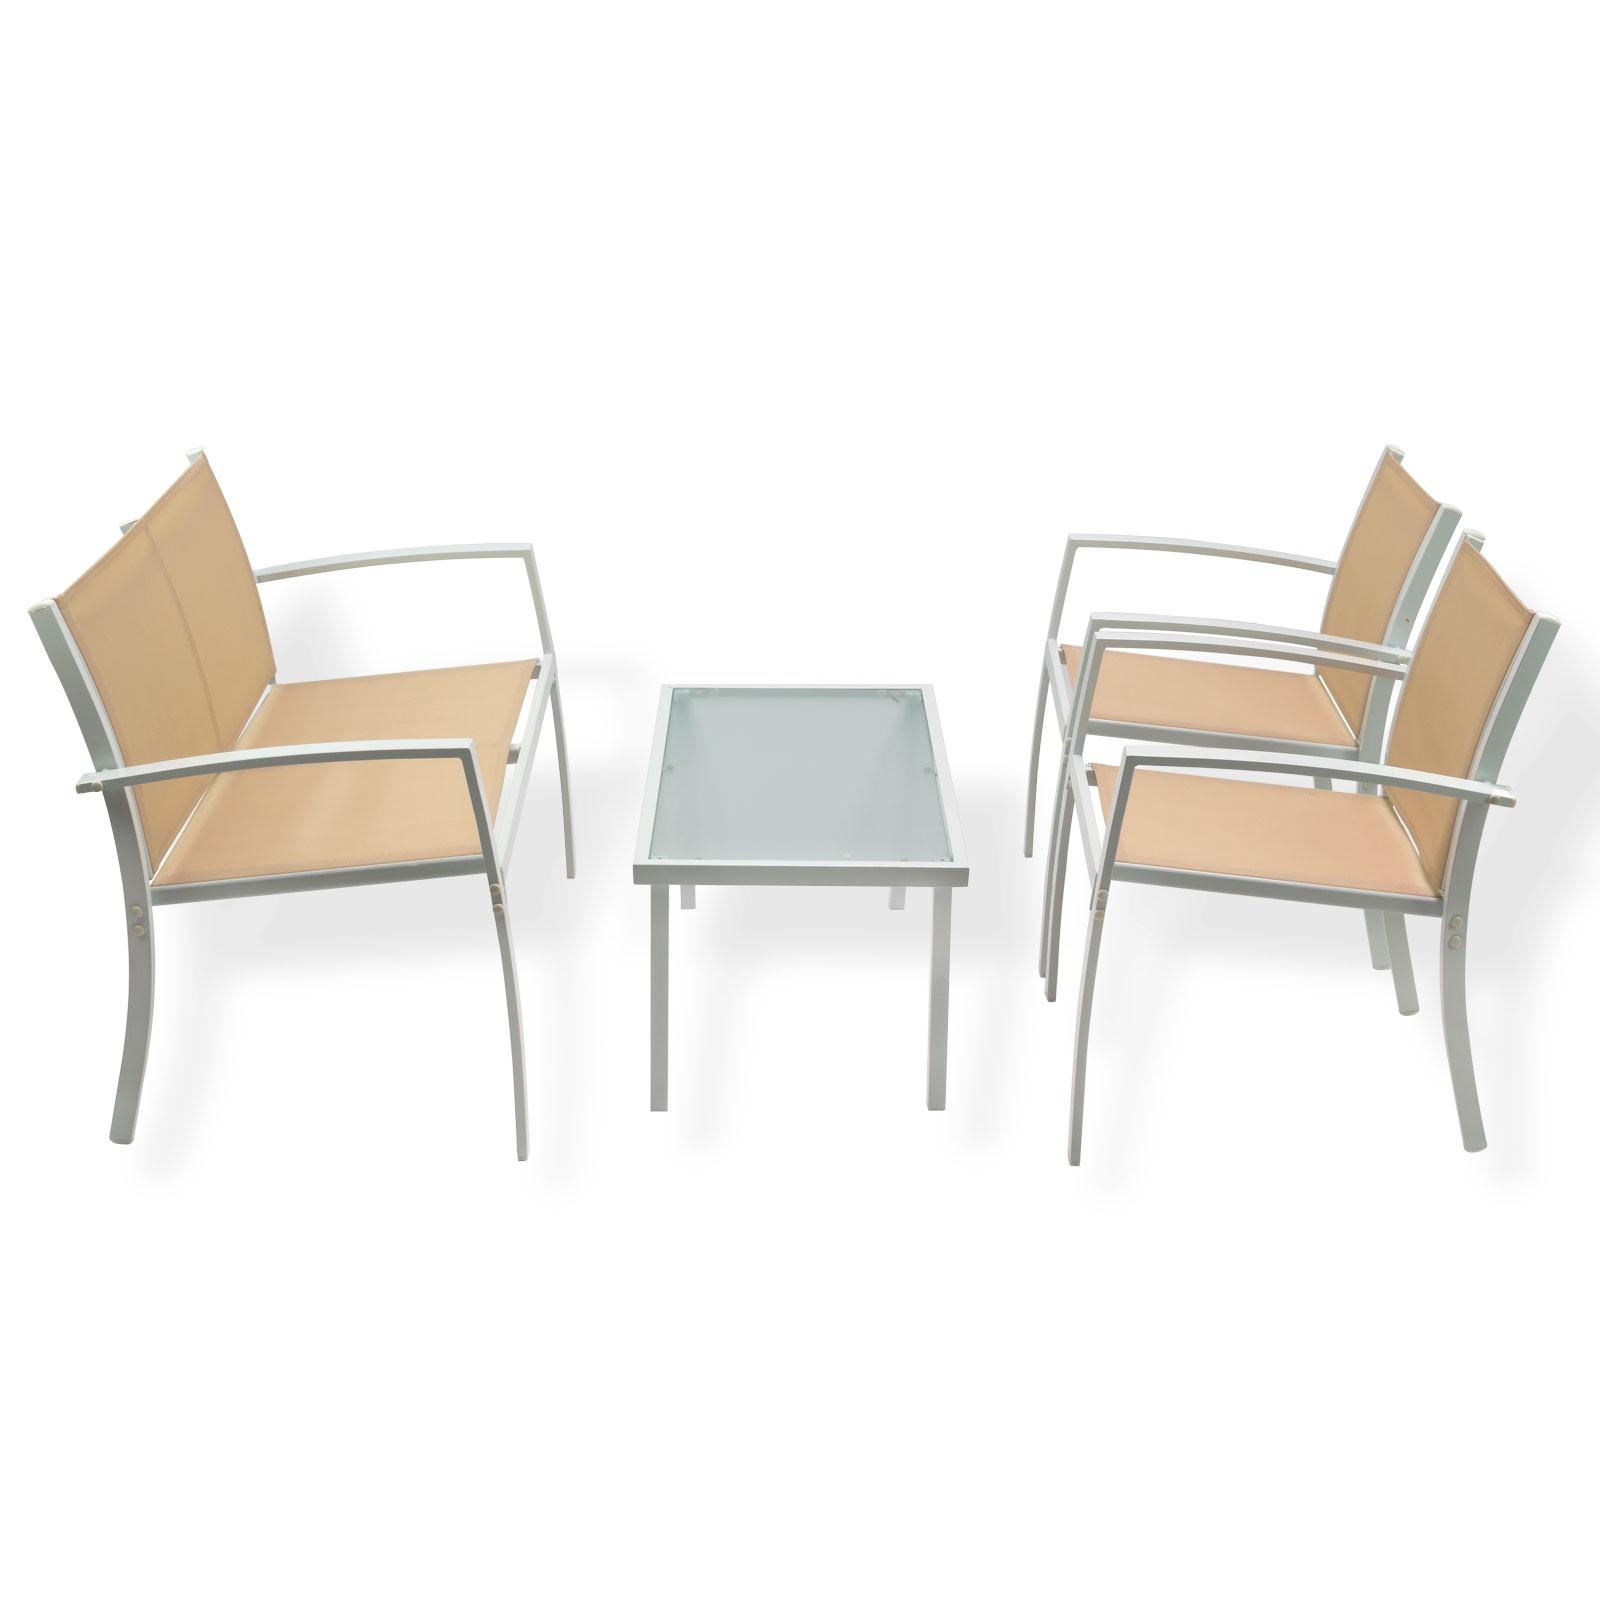 Gartenmöbel Sitzgruppe -Miami- beige 4-tlg. Metall/Kunstfaser